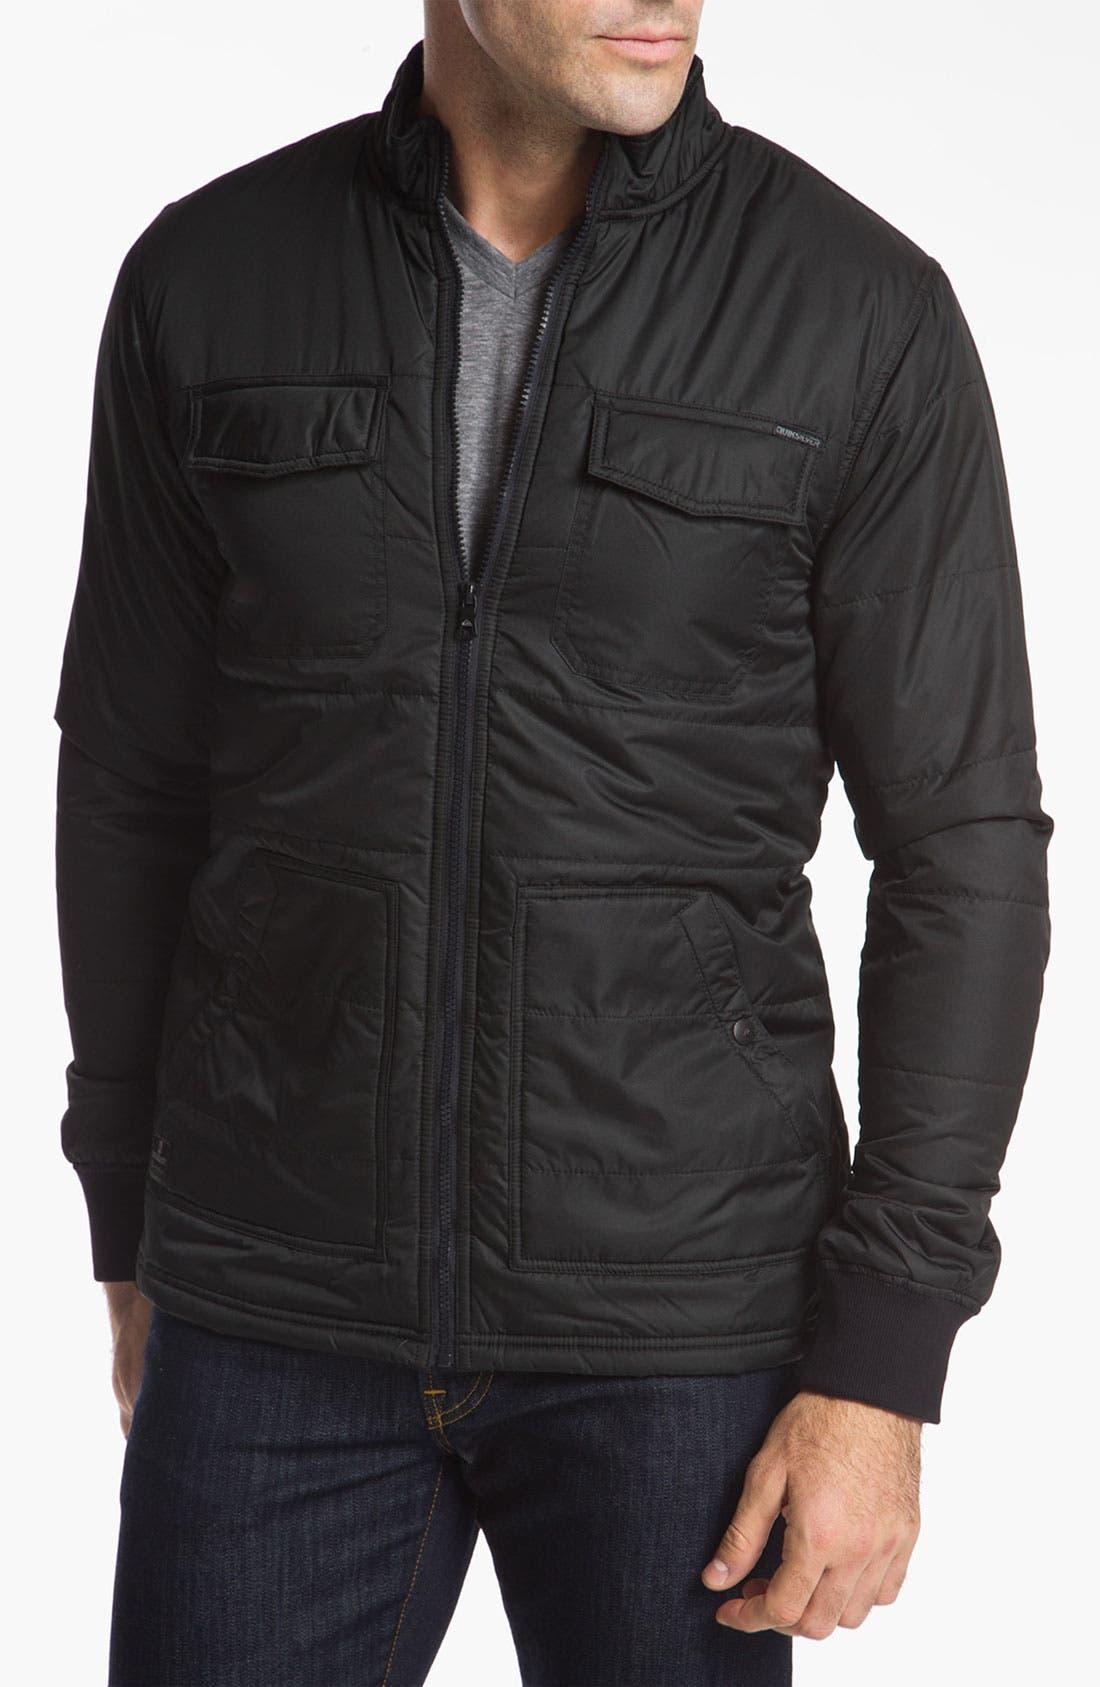 Alternate Image 1 Selected - Quiksilver 'Steadfast' Jacket